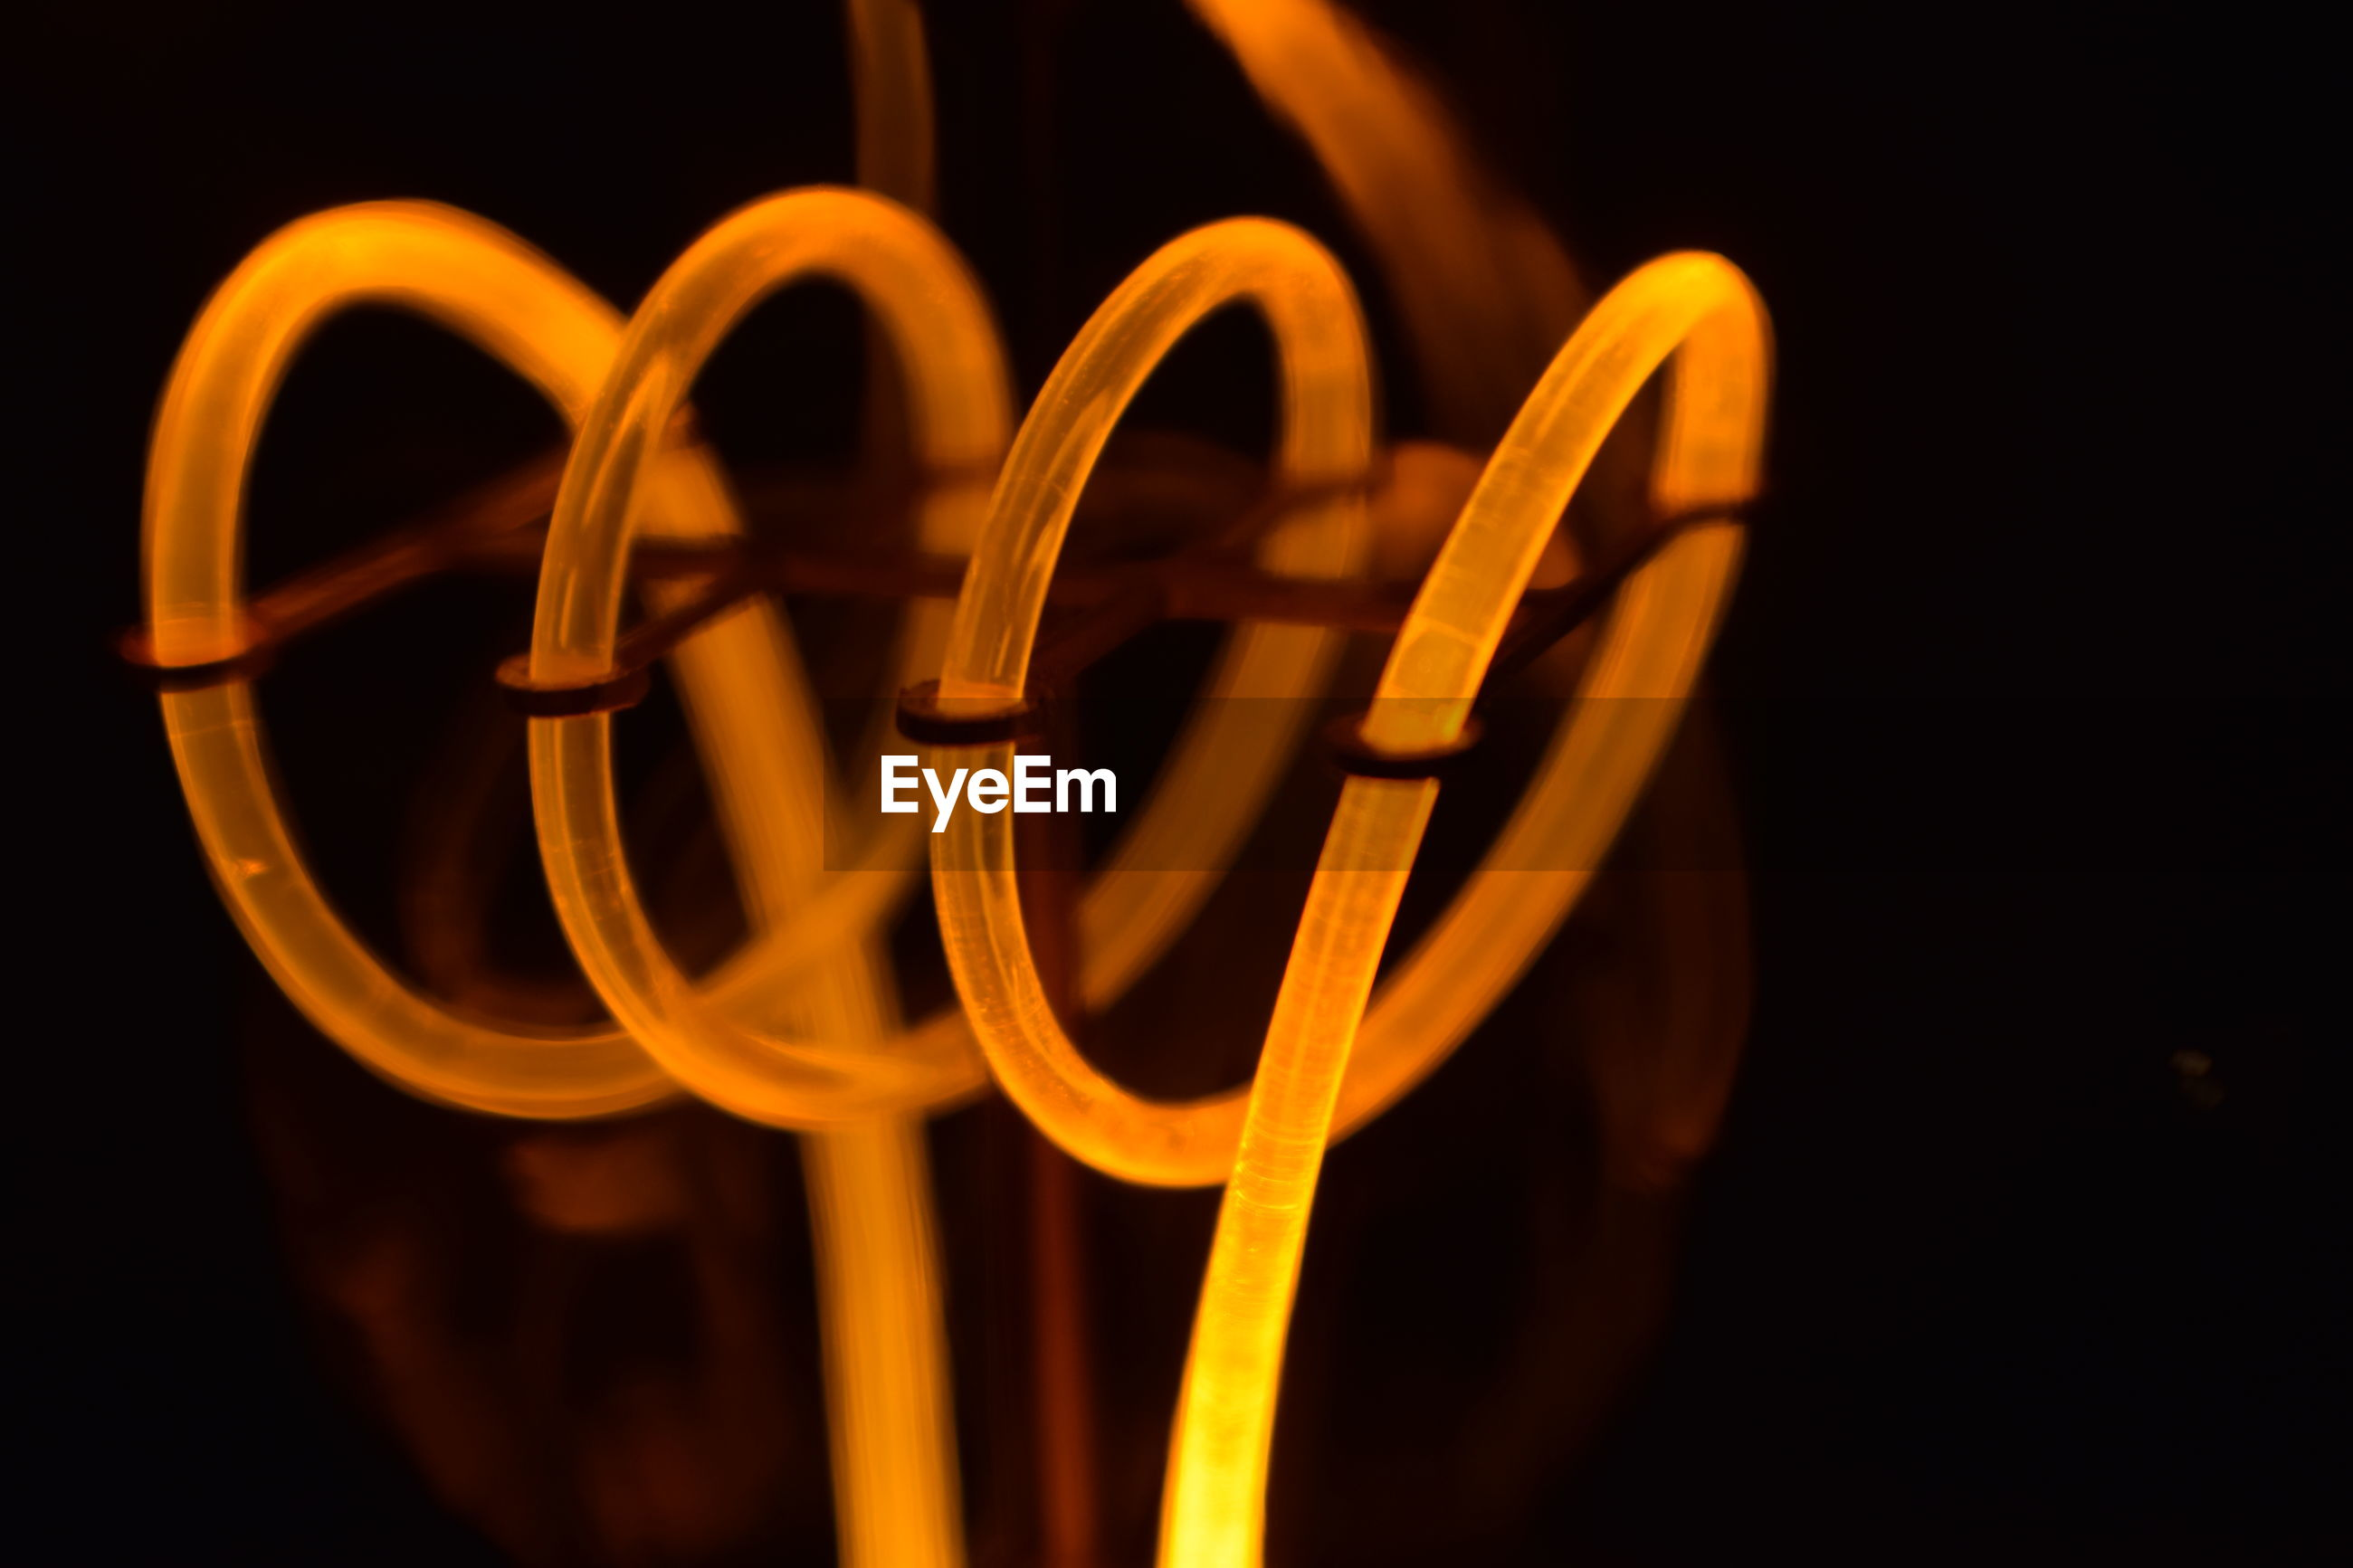 Close-up of illuminated fiber optic cable against black background